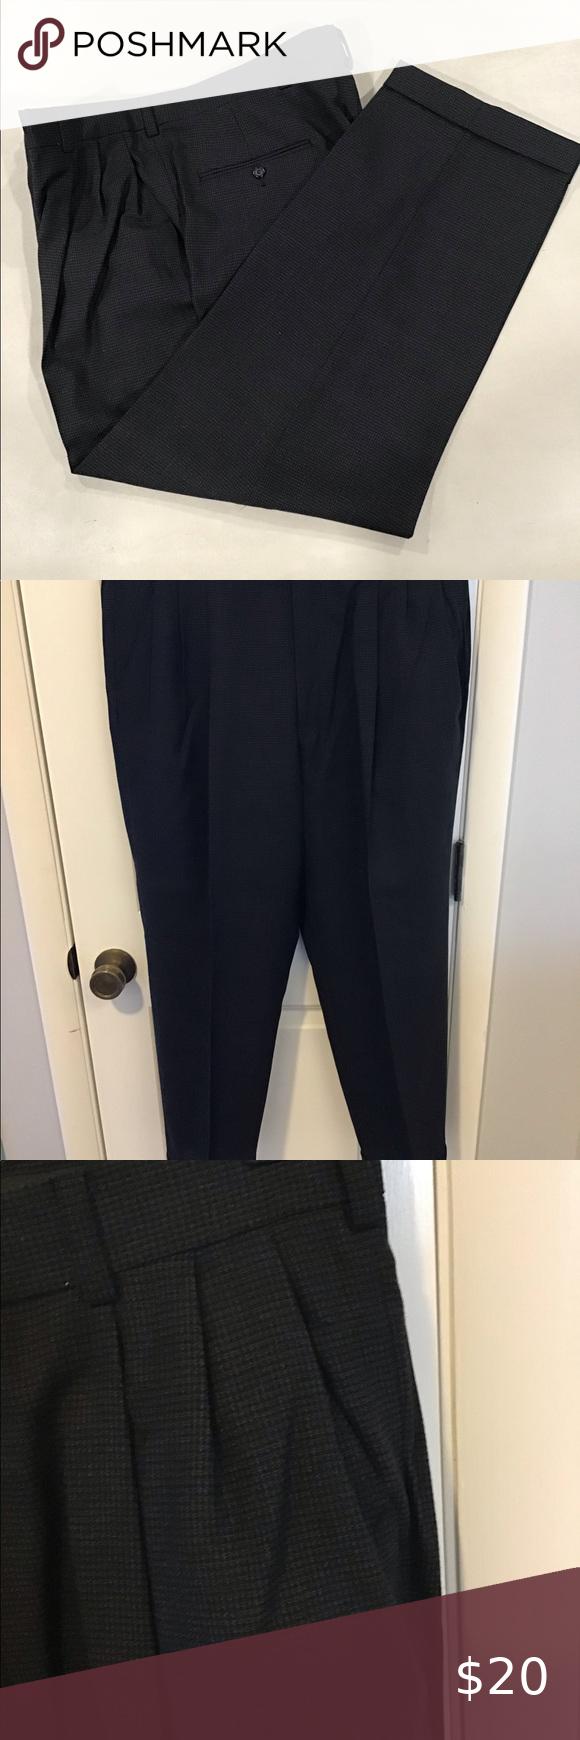 Austin Reed Mens Dress Pants 36 29 Black Check Austin Reed Mens Dress Pants 36 29 Straight Leg Cuffs Two Fro In 2020 Mens Dress Pants Dress Pants Clothes Design